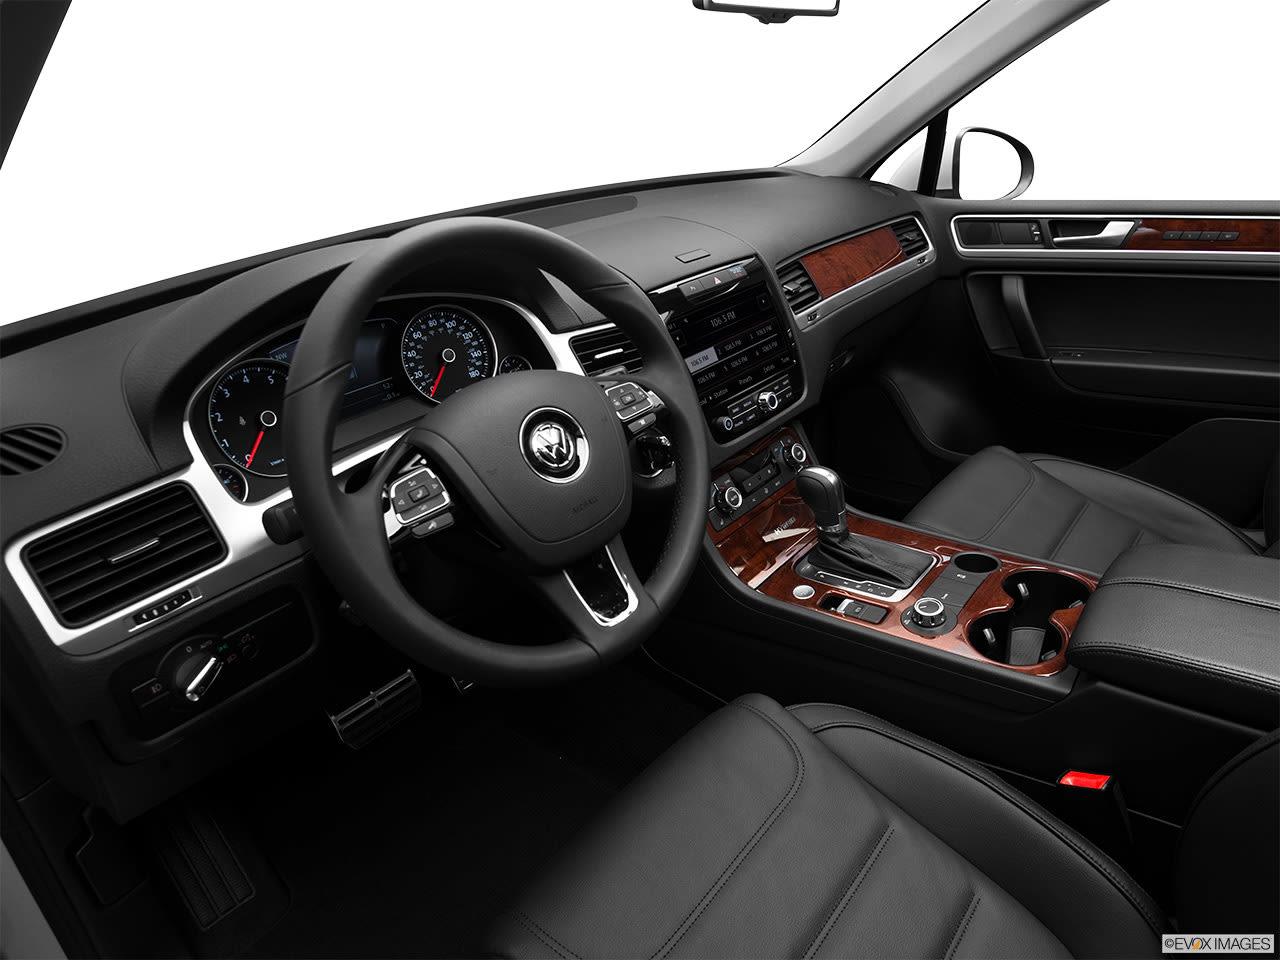 Volkswagen Touareg Hybrid 2012 Interior